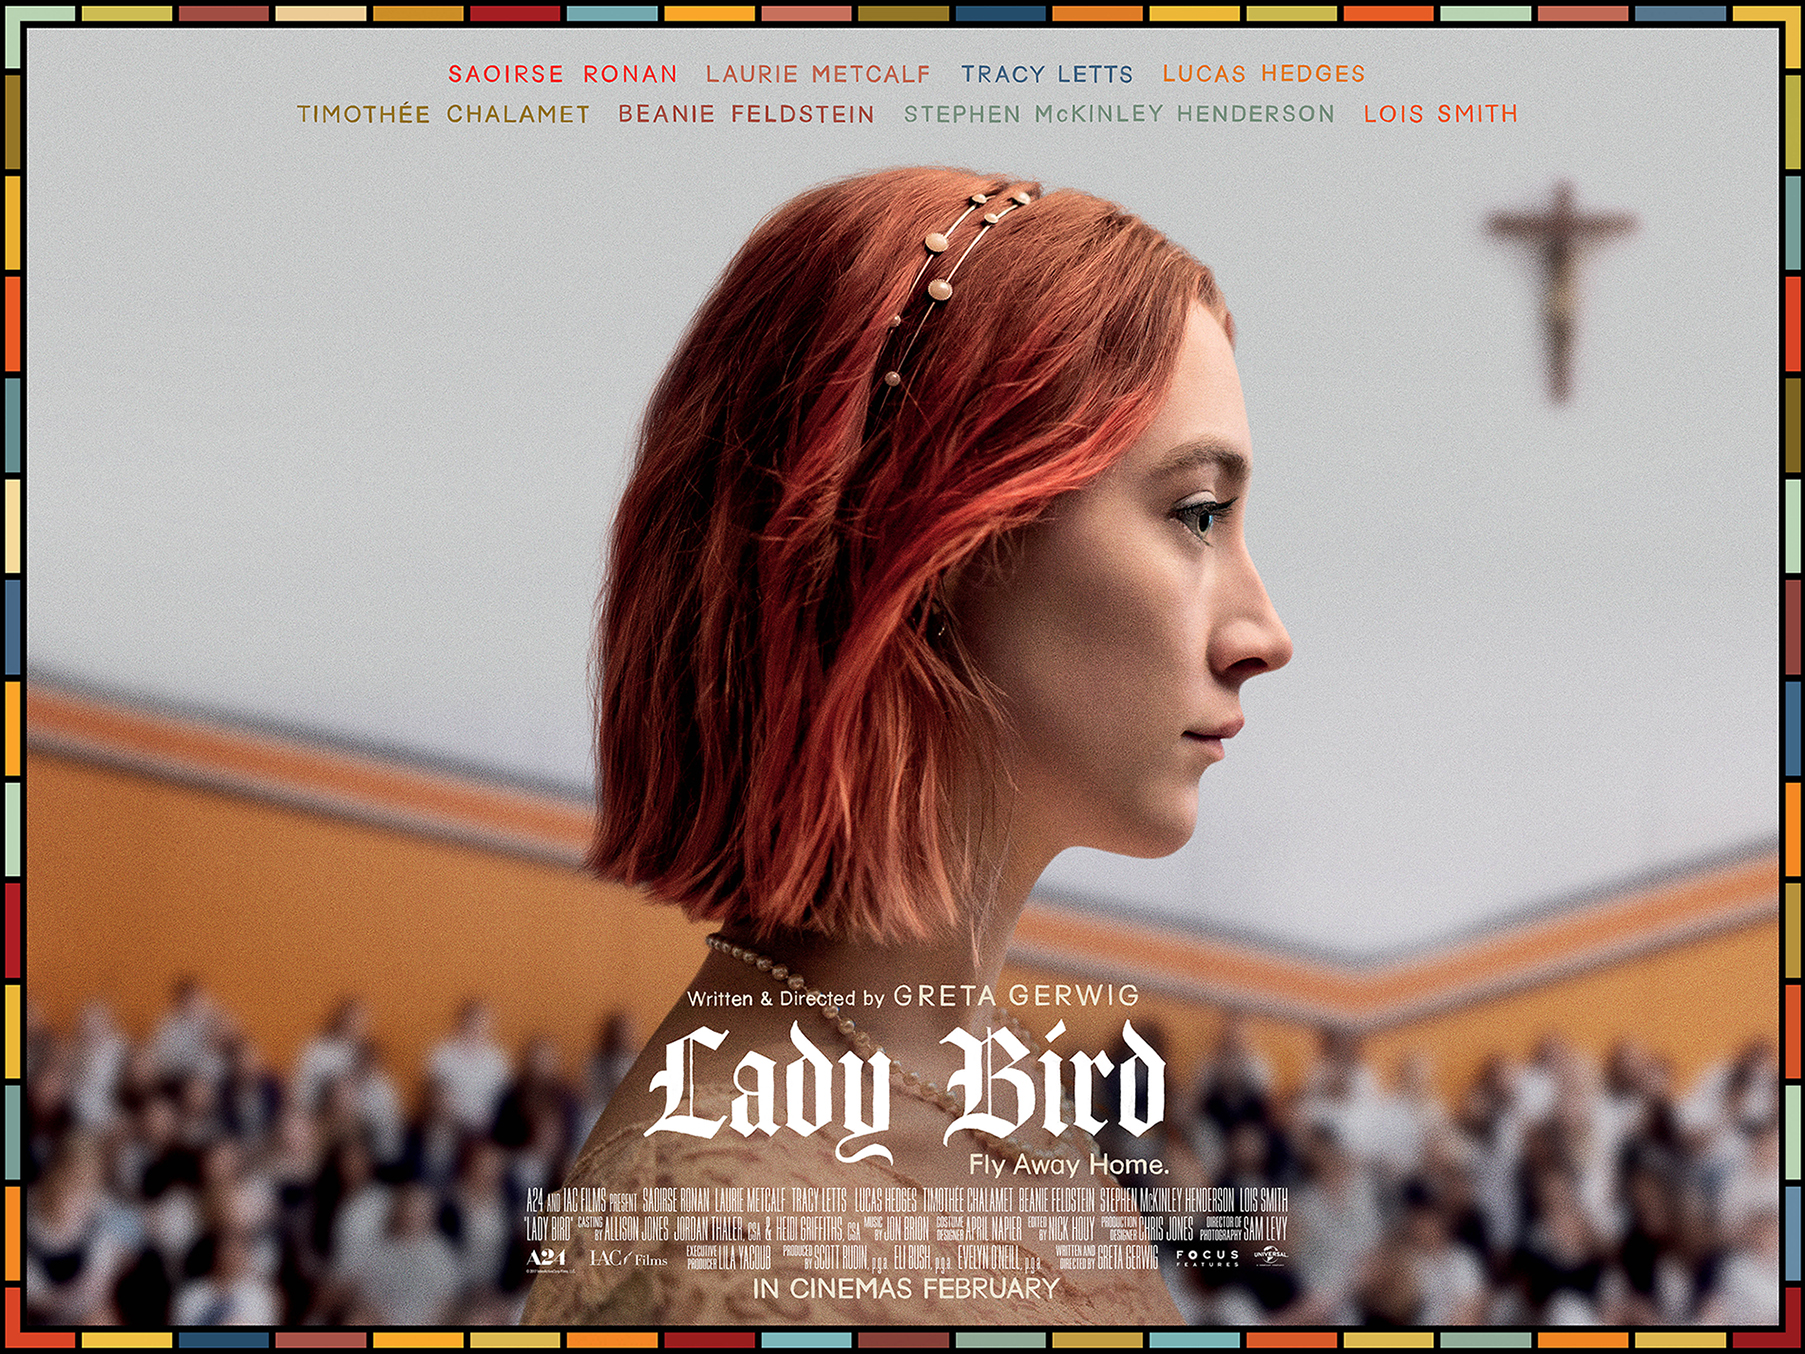 Lady Bird poster, signed by Greta Gerwig